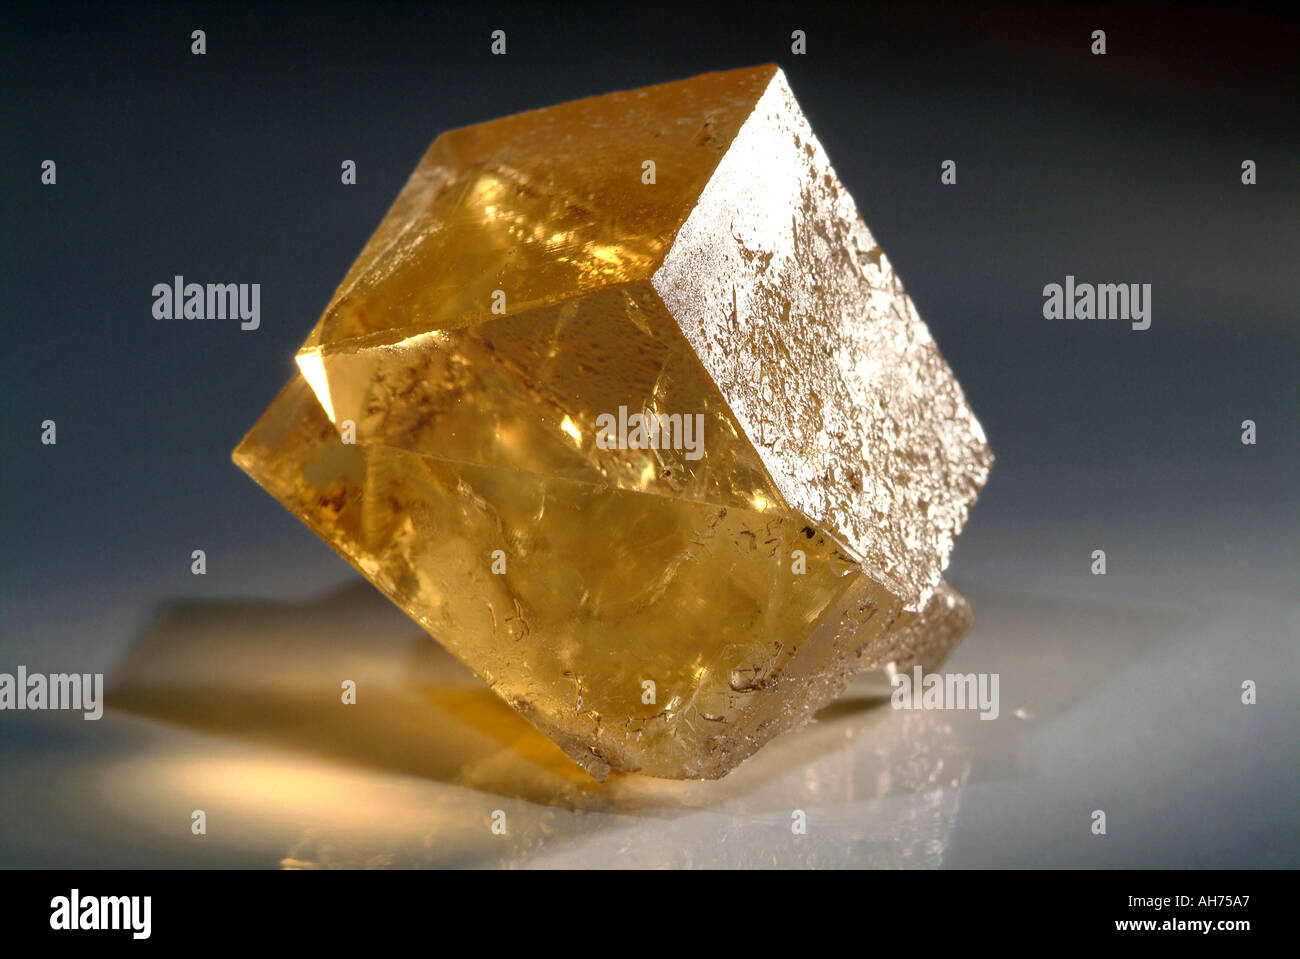 Mineral Fluorite, Single twin on transparent yellow fluorite, Hilton mine, Scordale, Cumbria, England - Stock Image